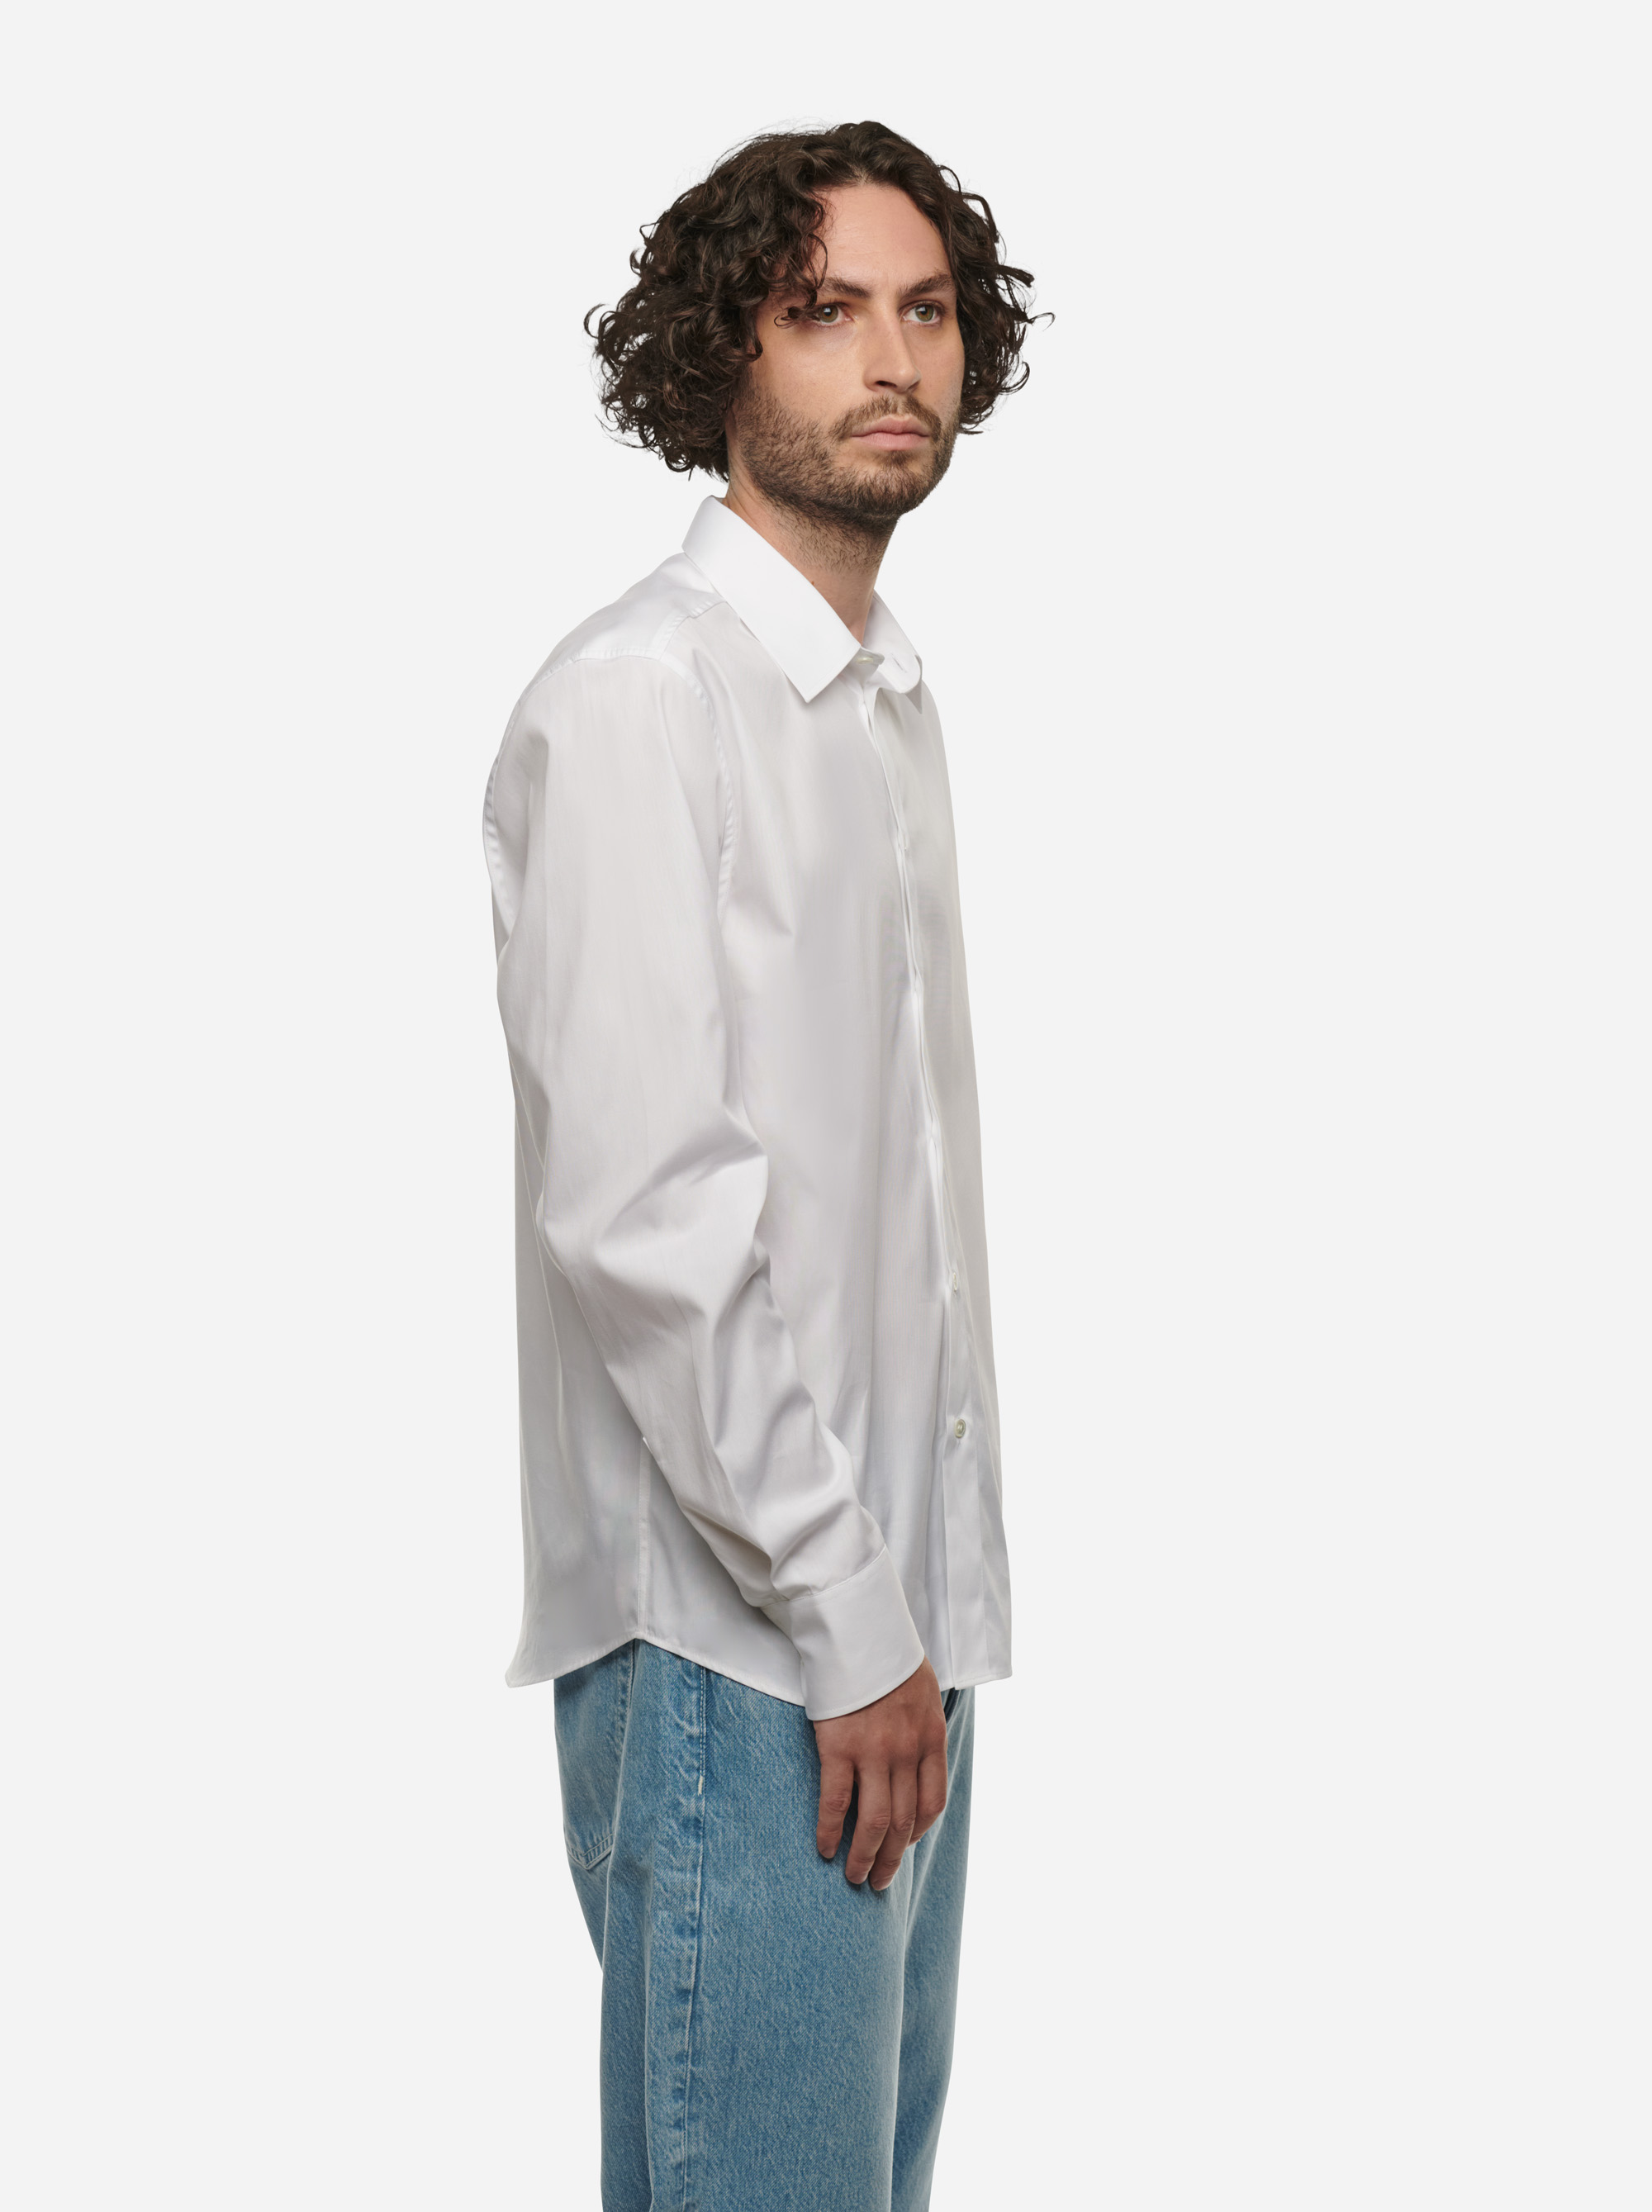 Teym - The Shirt - Men - White - 2